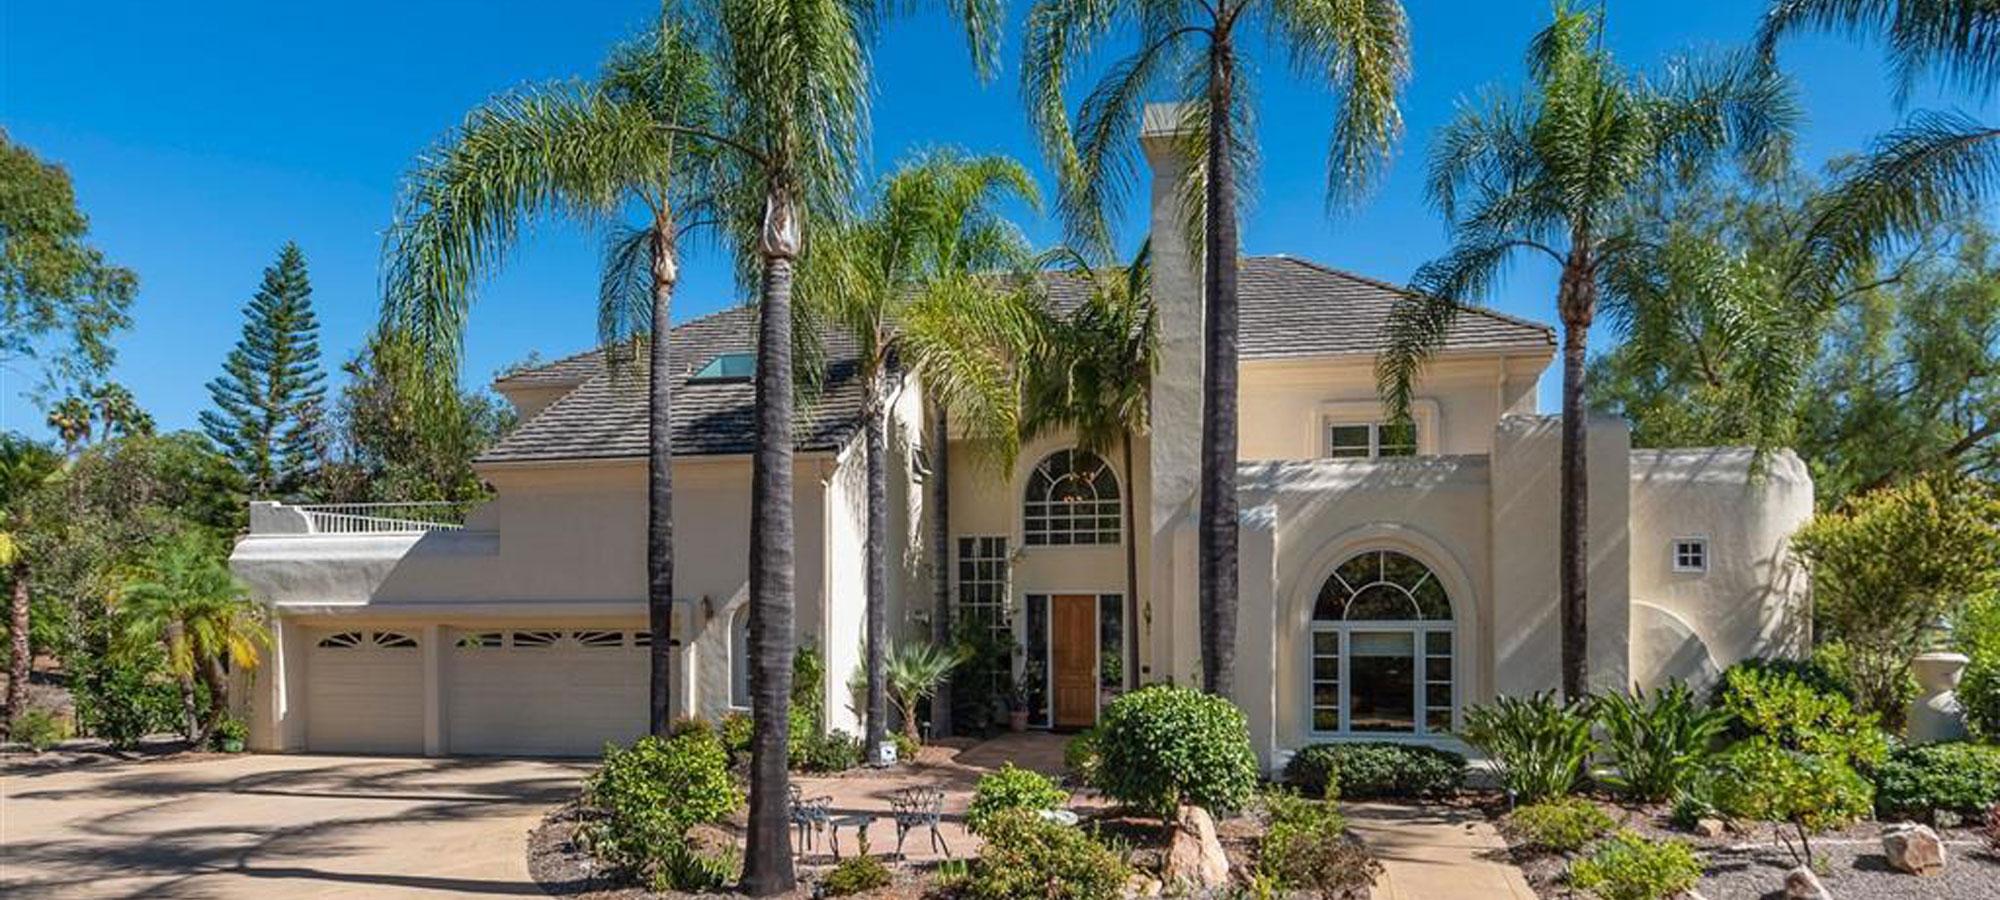 15135 Huntington Gate Dr. Poway, CA 92064